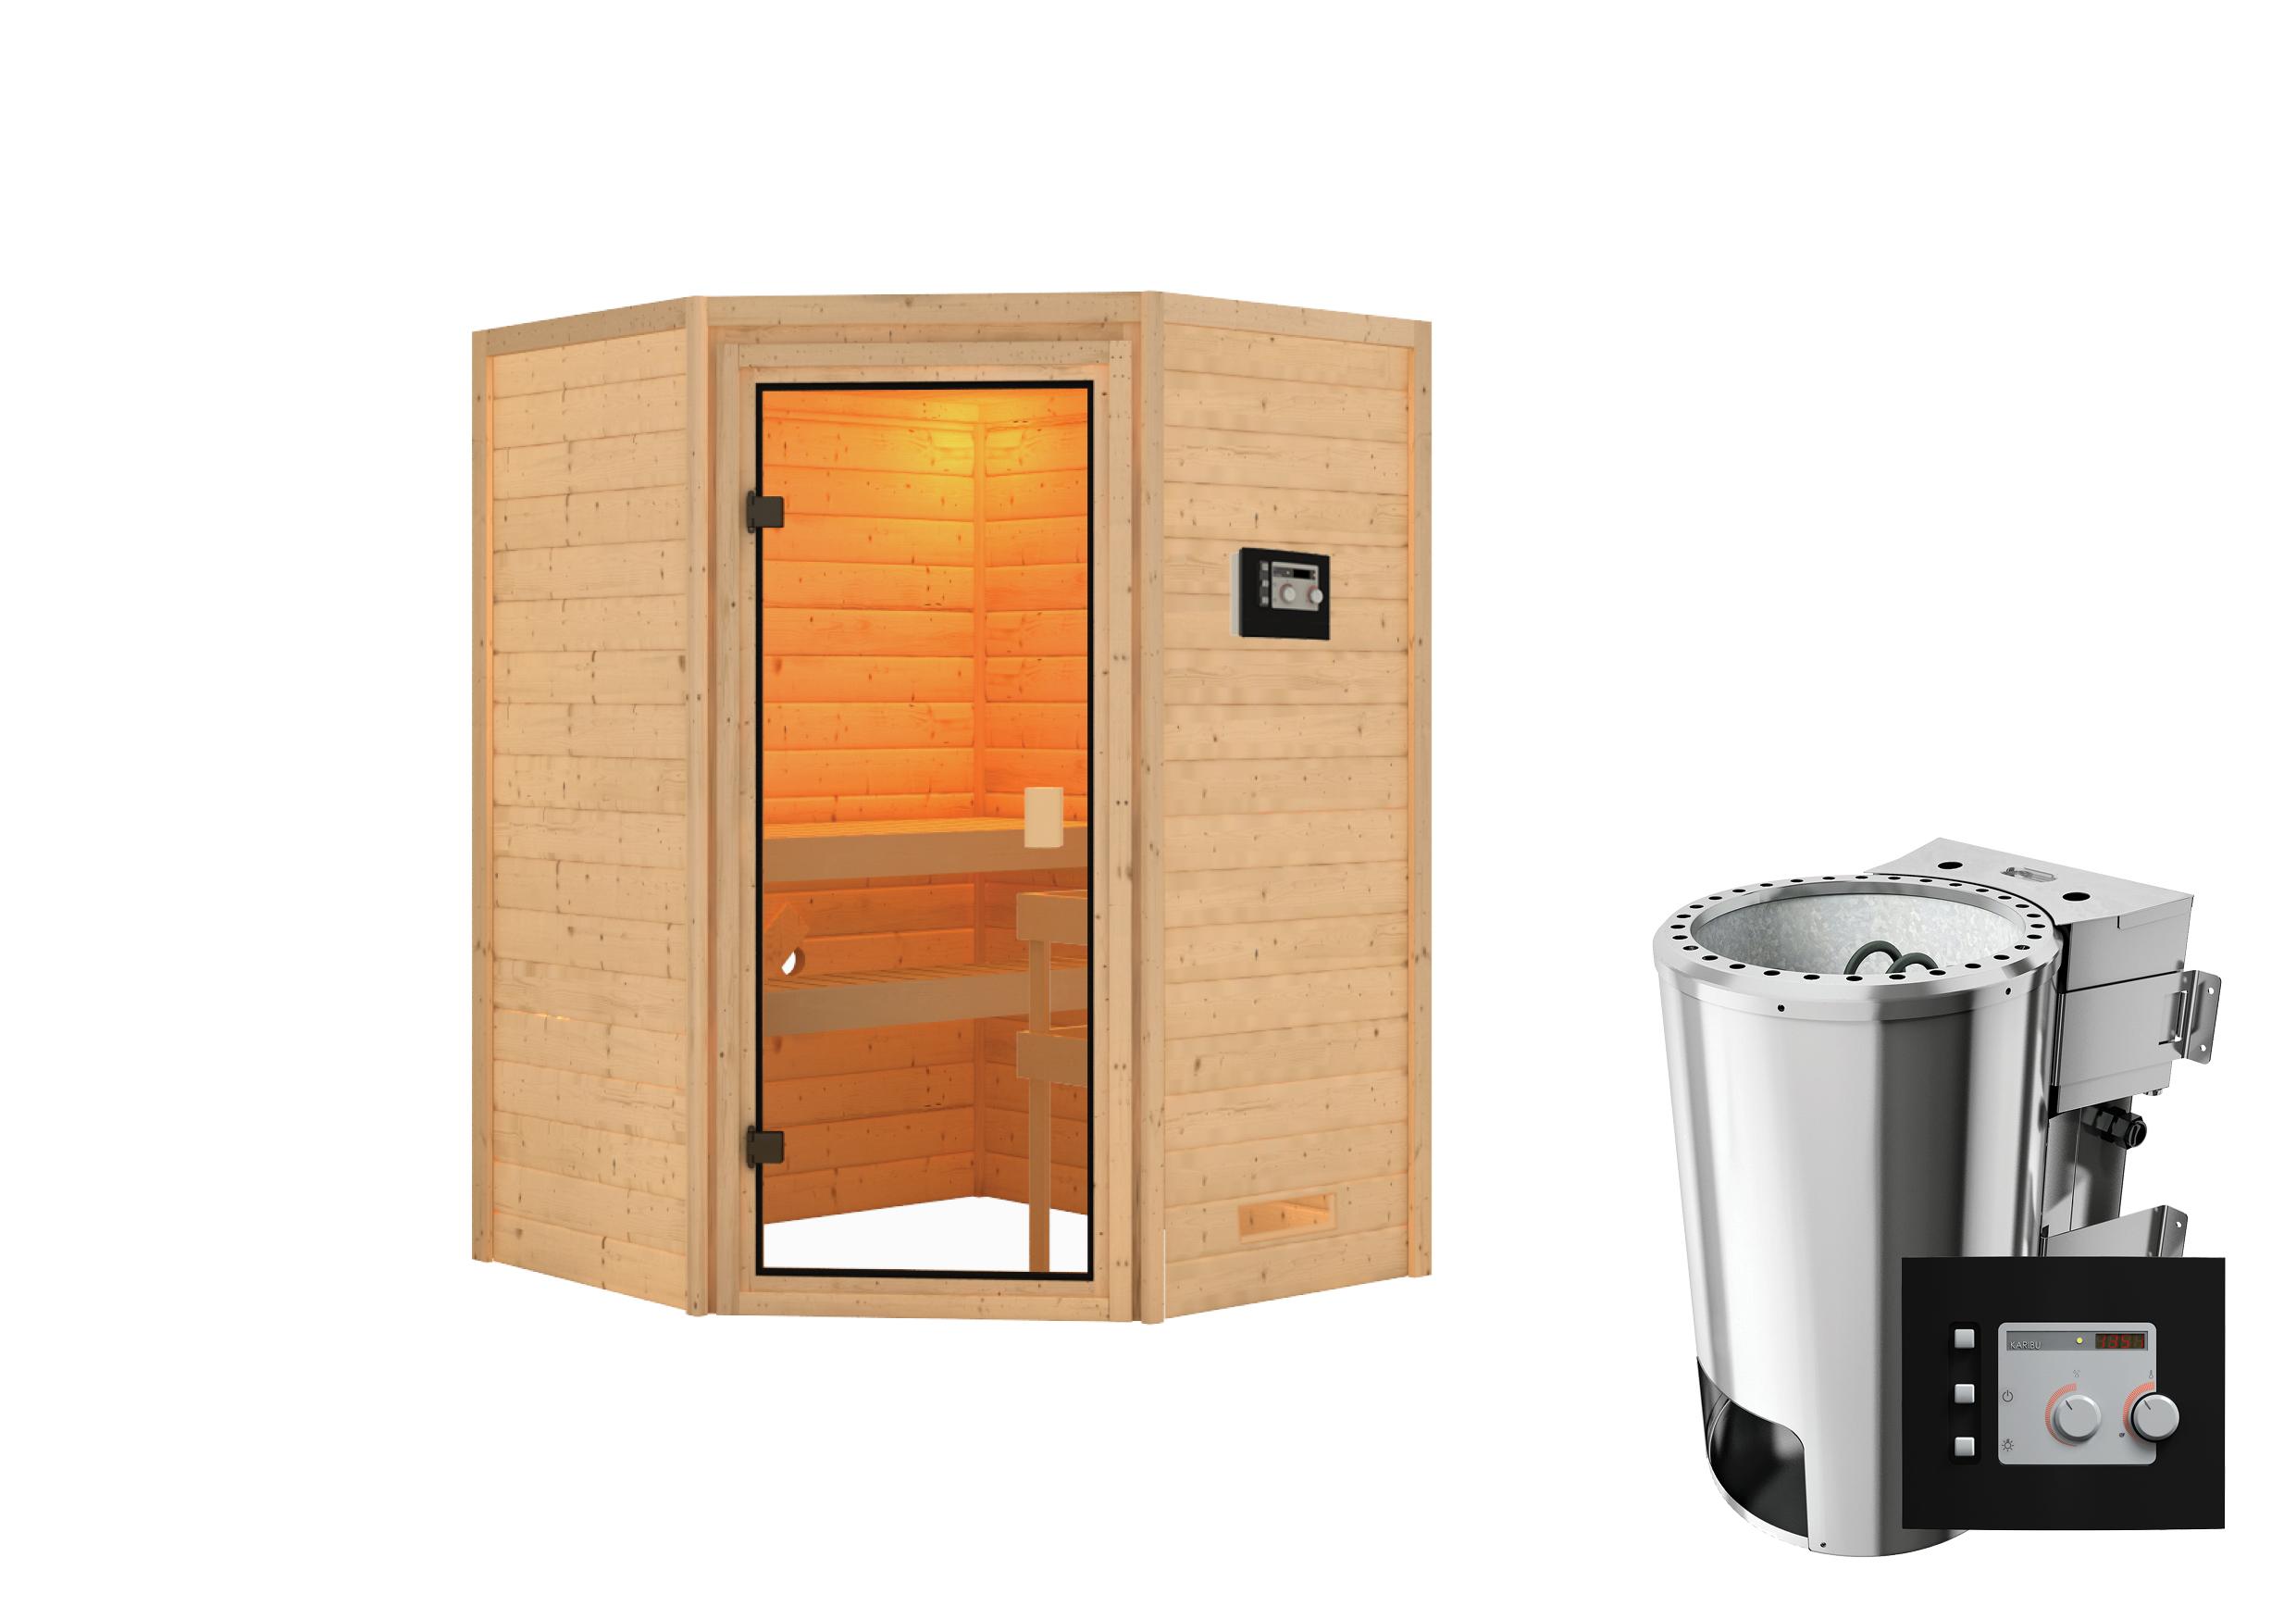 Woodfeeling Sauna Antonia 38mm 230V Bio Saunaofen 3,6 kW extern Bild 4